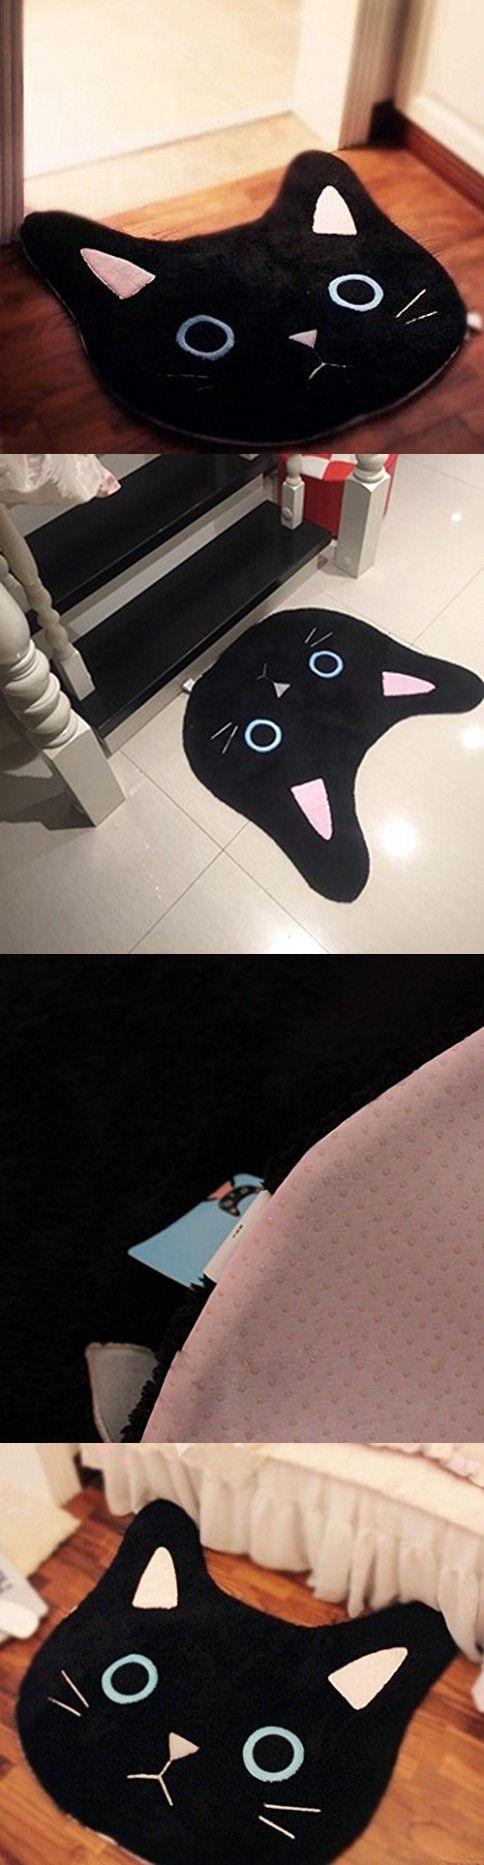 Wolala Home Cute Cartoon Dream Black Cats Pattern Area Rug Simple Cozy Non-slip Toilet Mat Doormat (2'0x2'0, black)